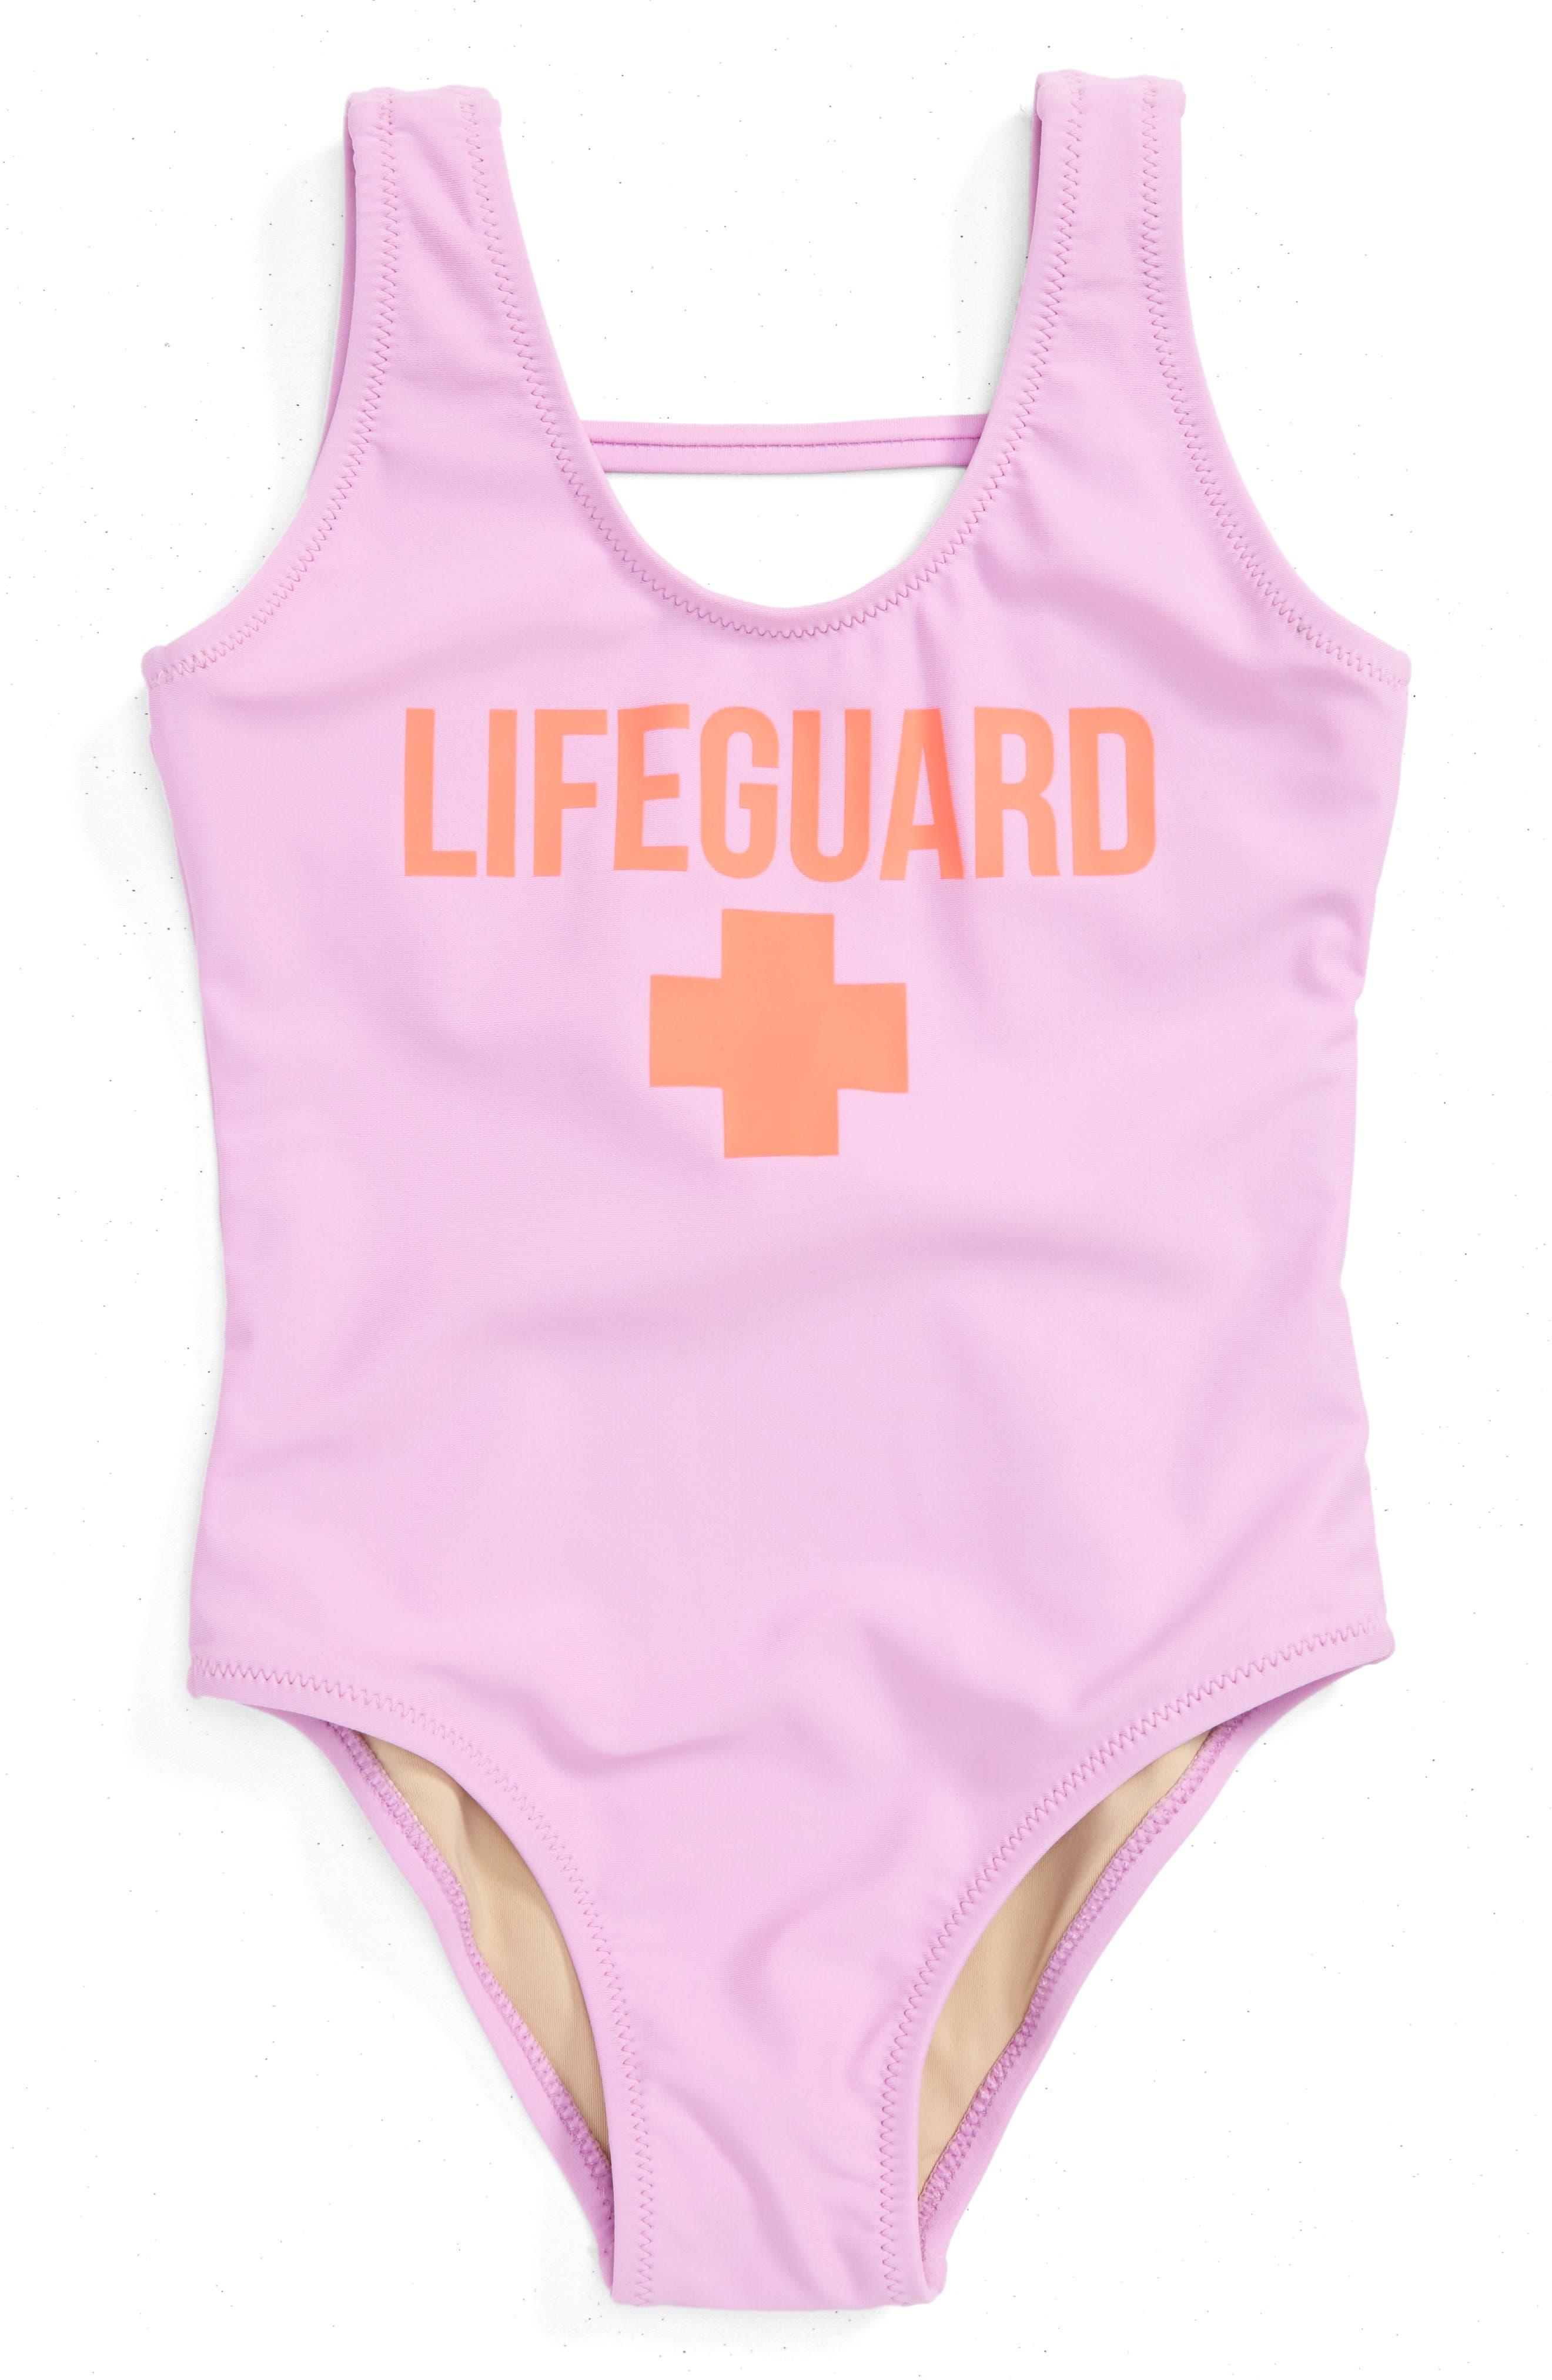 Main Image - Shade Critters Lifeguard One-Piece Swimsuit (Toddler Girls & Little Girls)